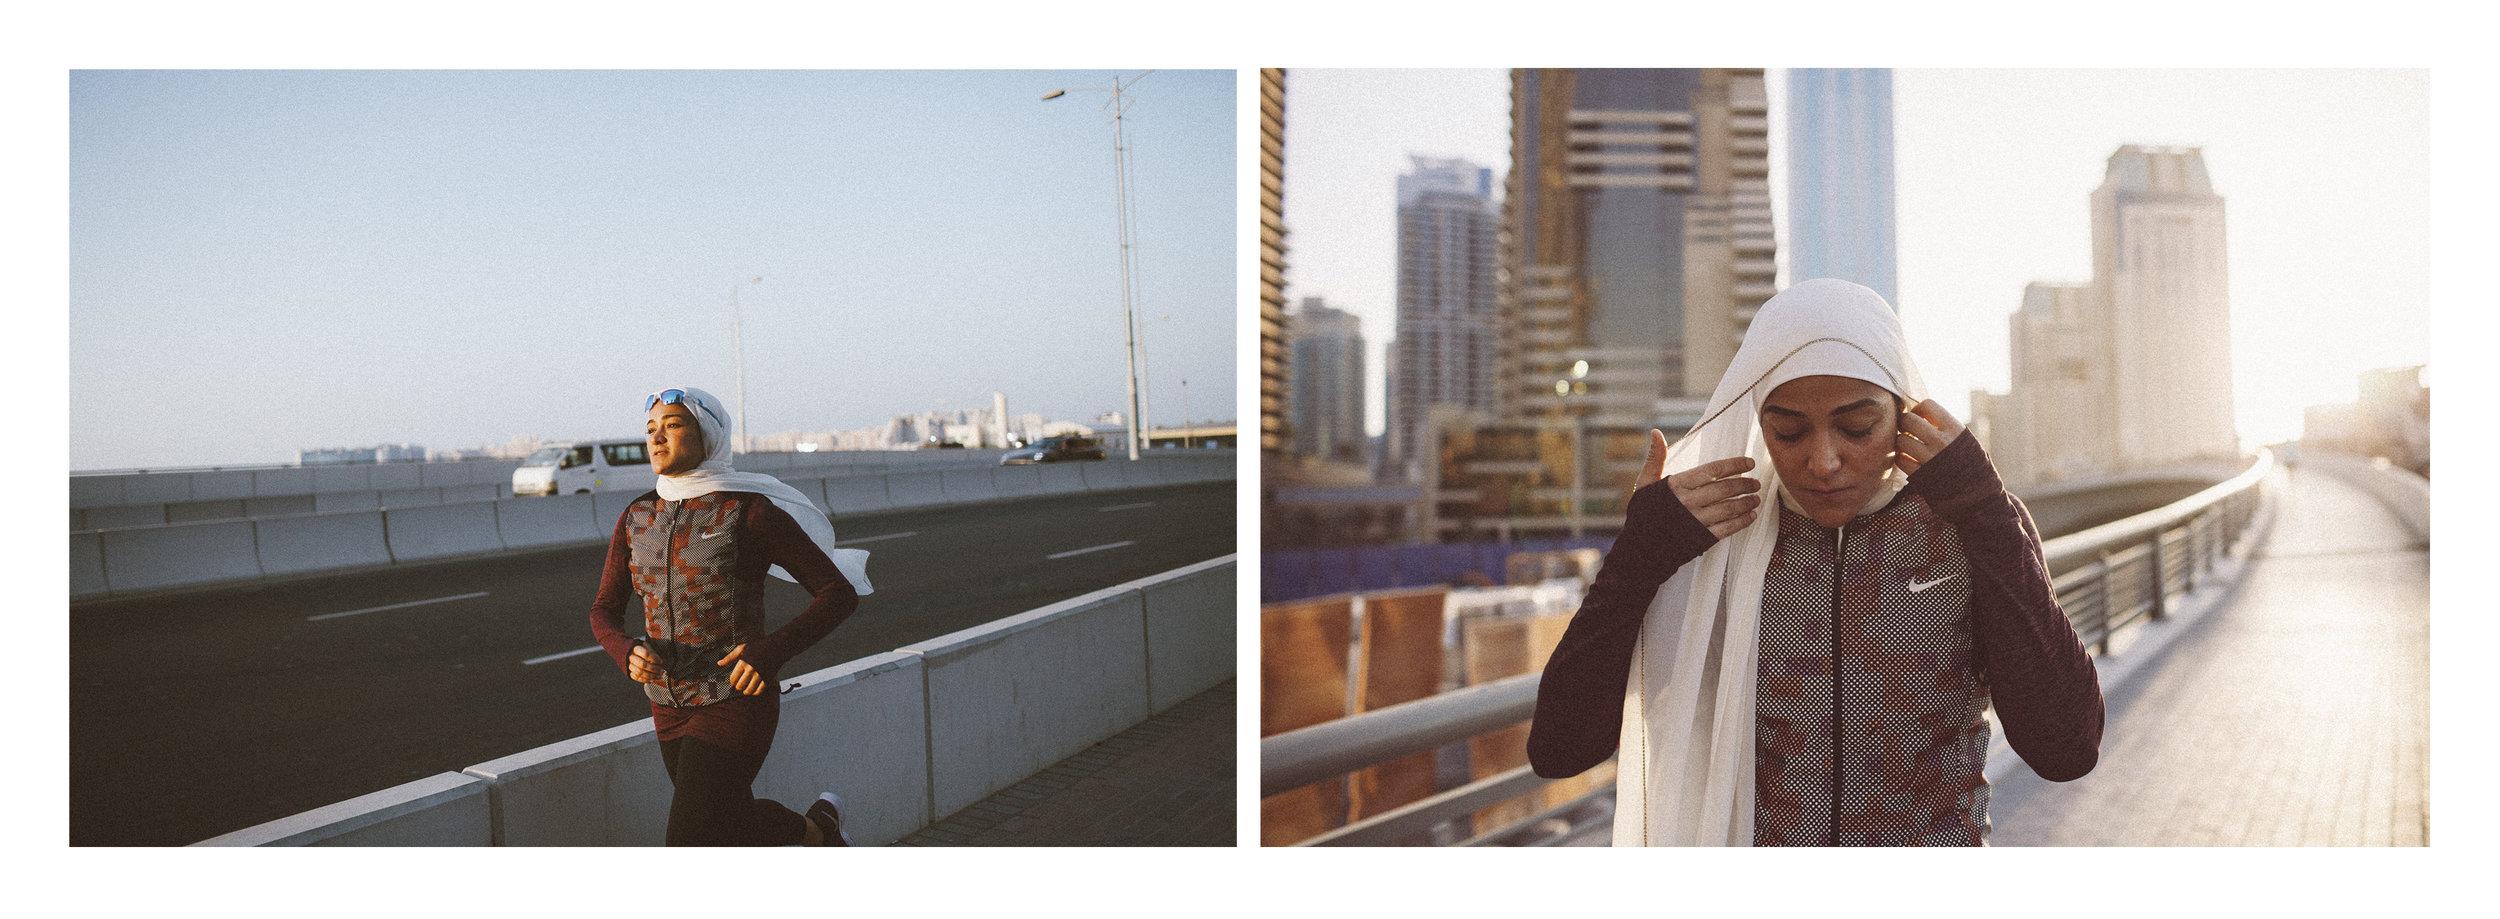 AnnaNielsenPhotographer_Nike_Brownbook_Dubai_02.JPG